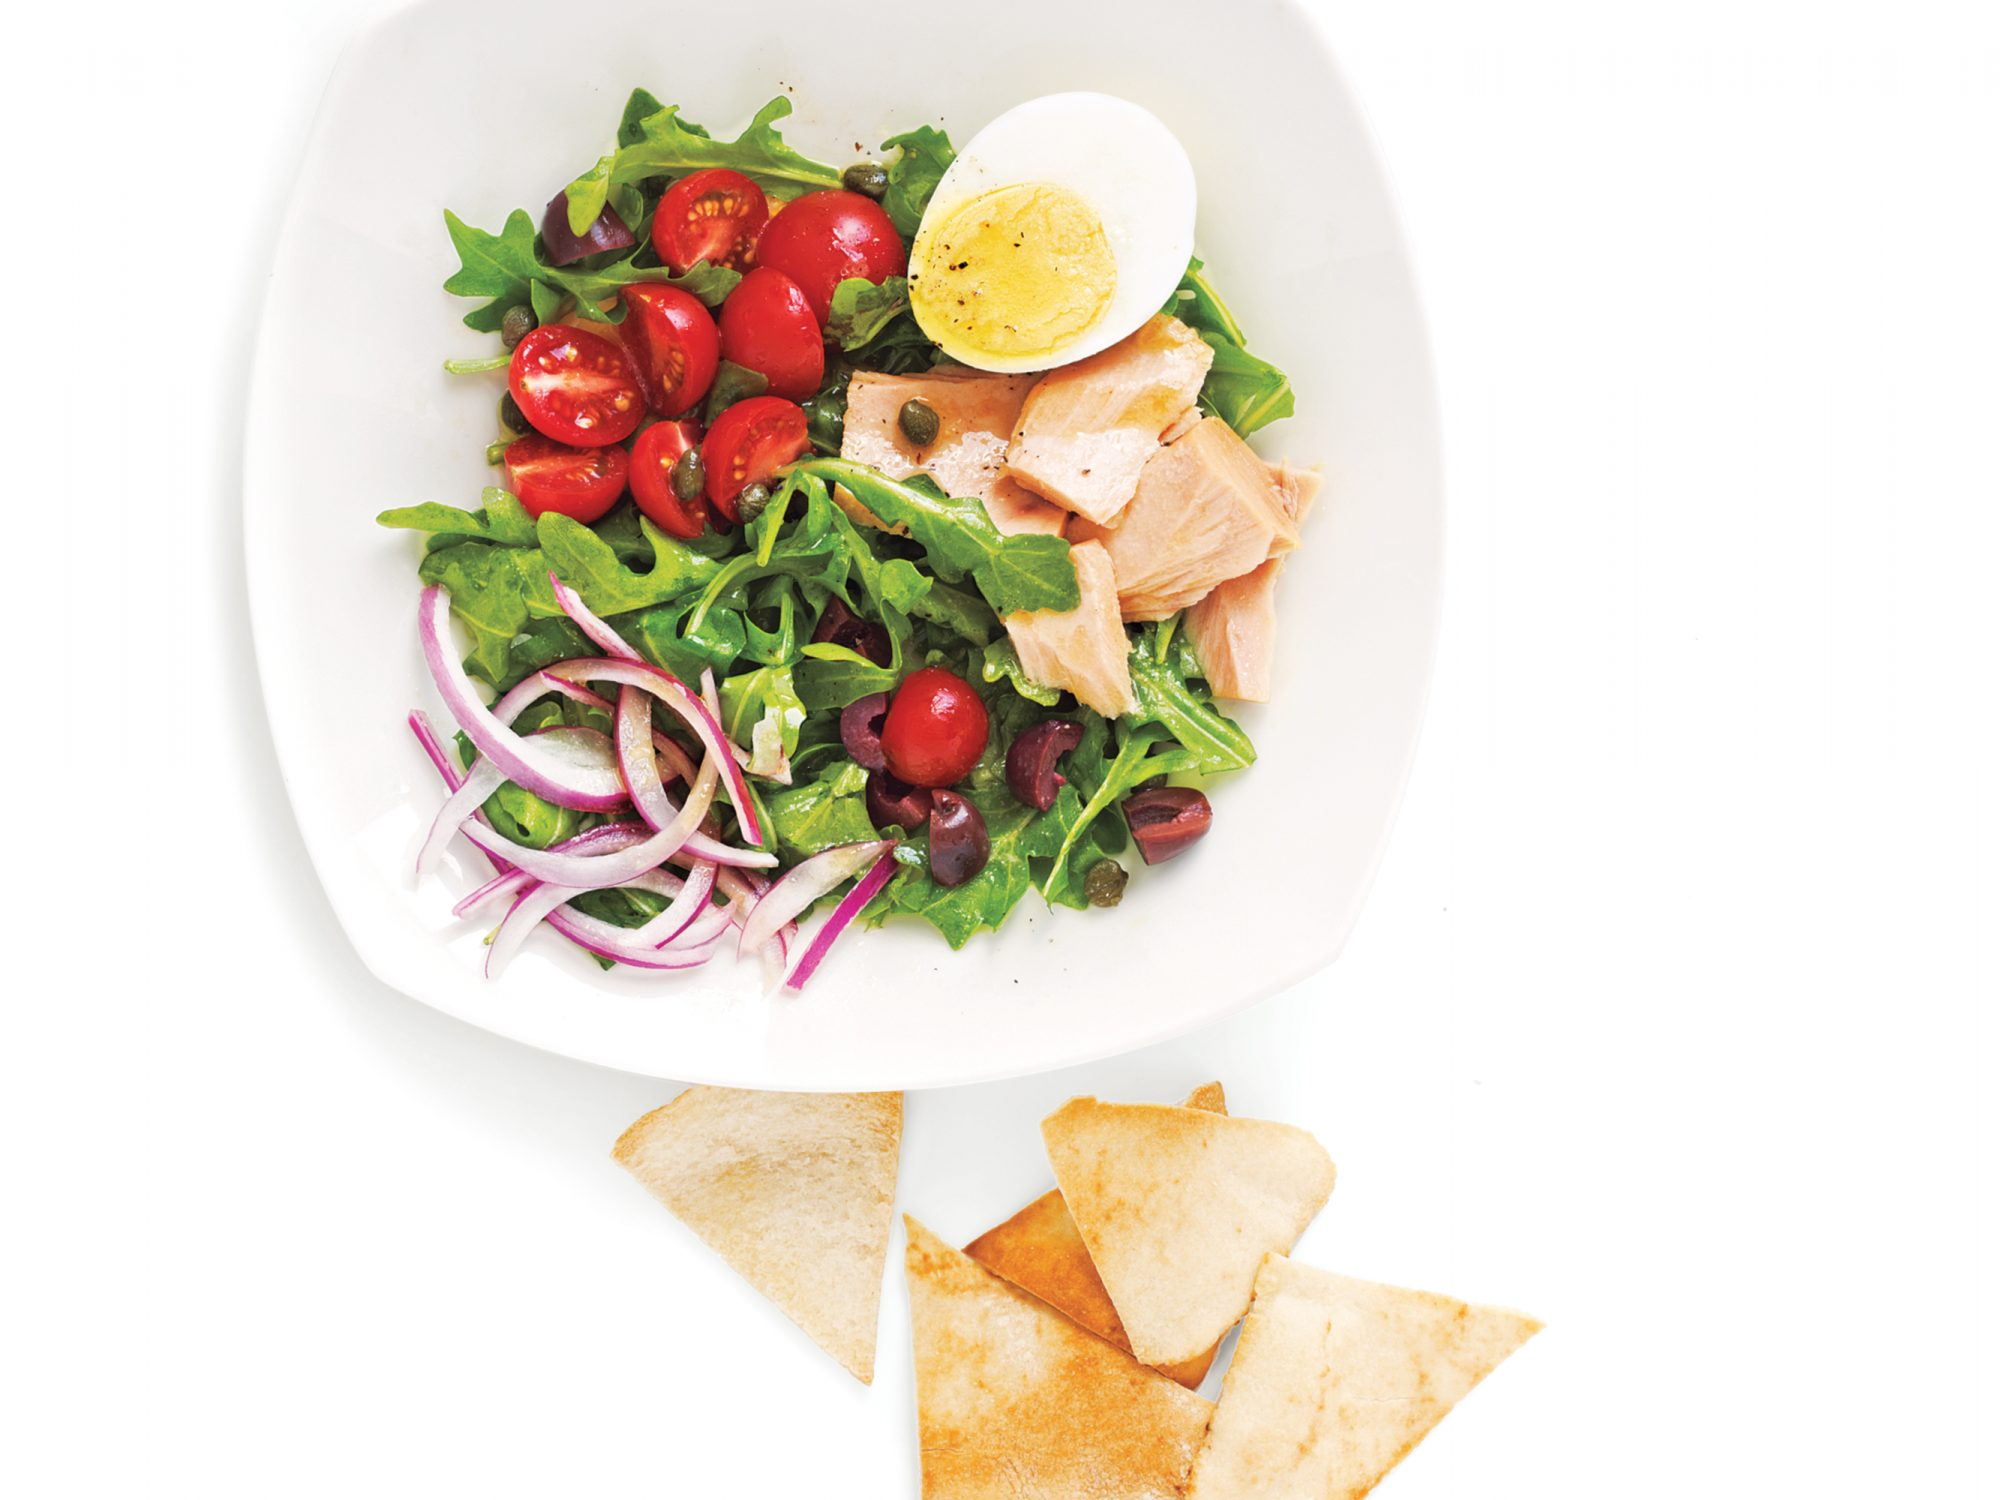 Tuna, Arugula, and Egg Salad with Pita Chips